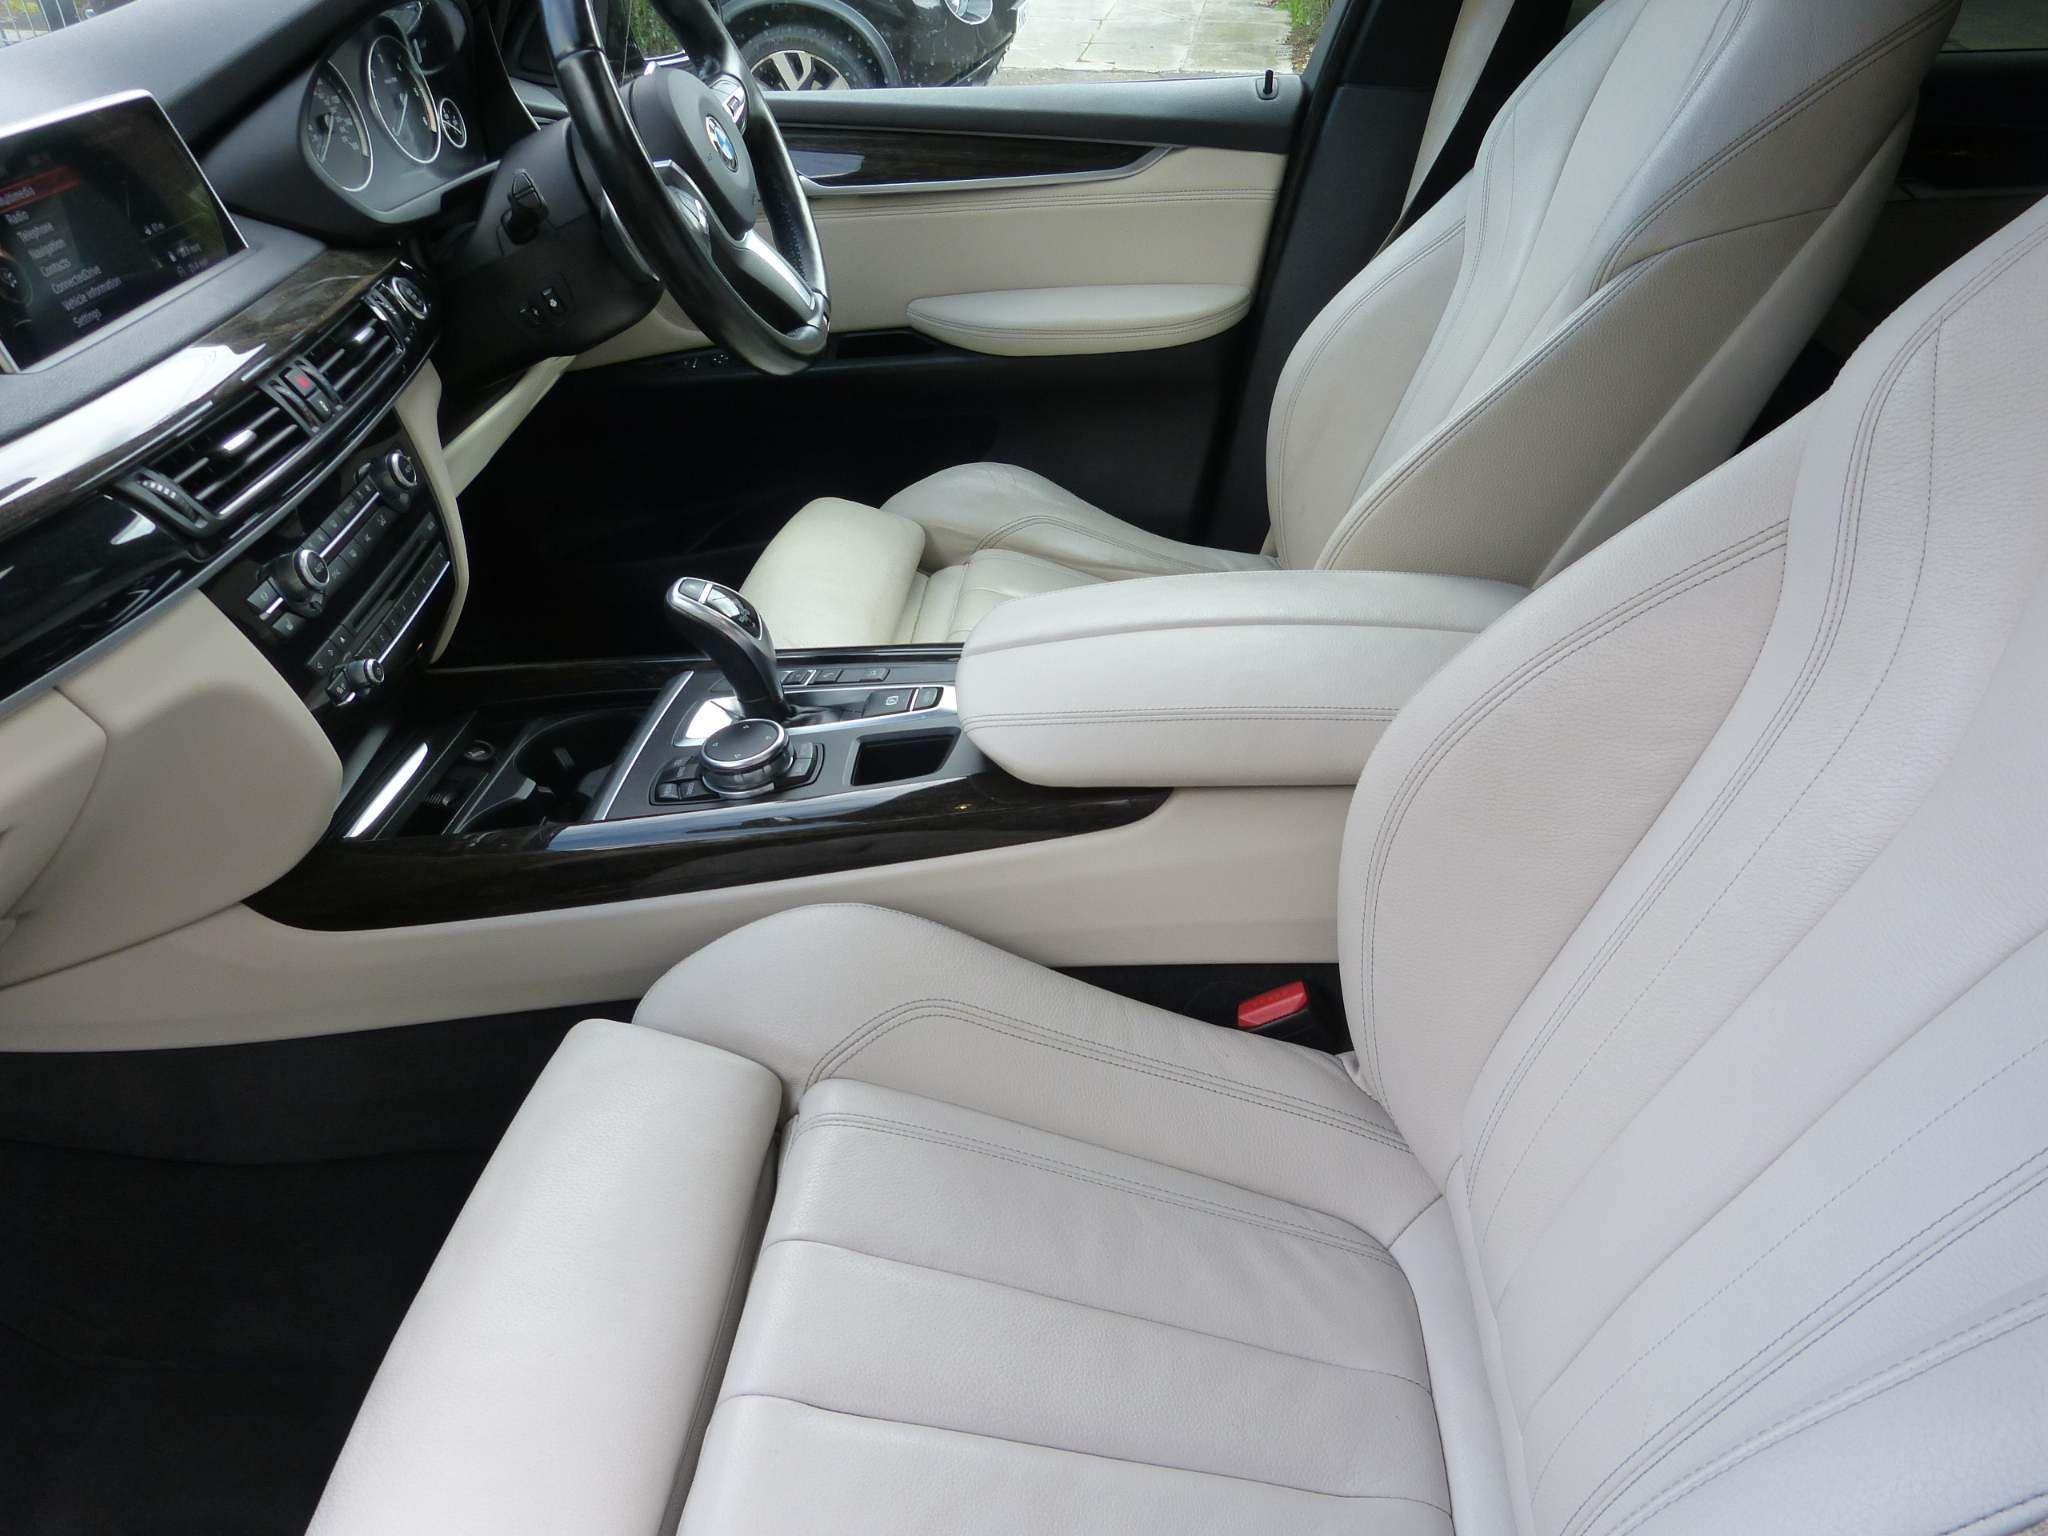 2015 BMW X5 3.0 30d M Sport Auto xDrive (s/s) Diesel Automatic seven seats  panoramic sunroof – Beechlawn Motors Belfast full